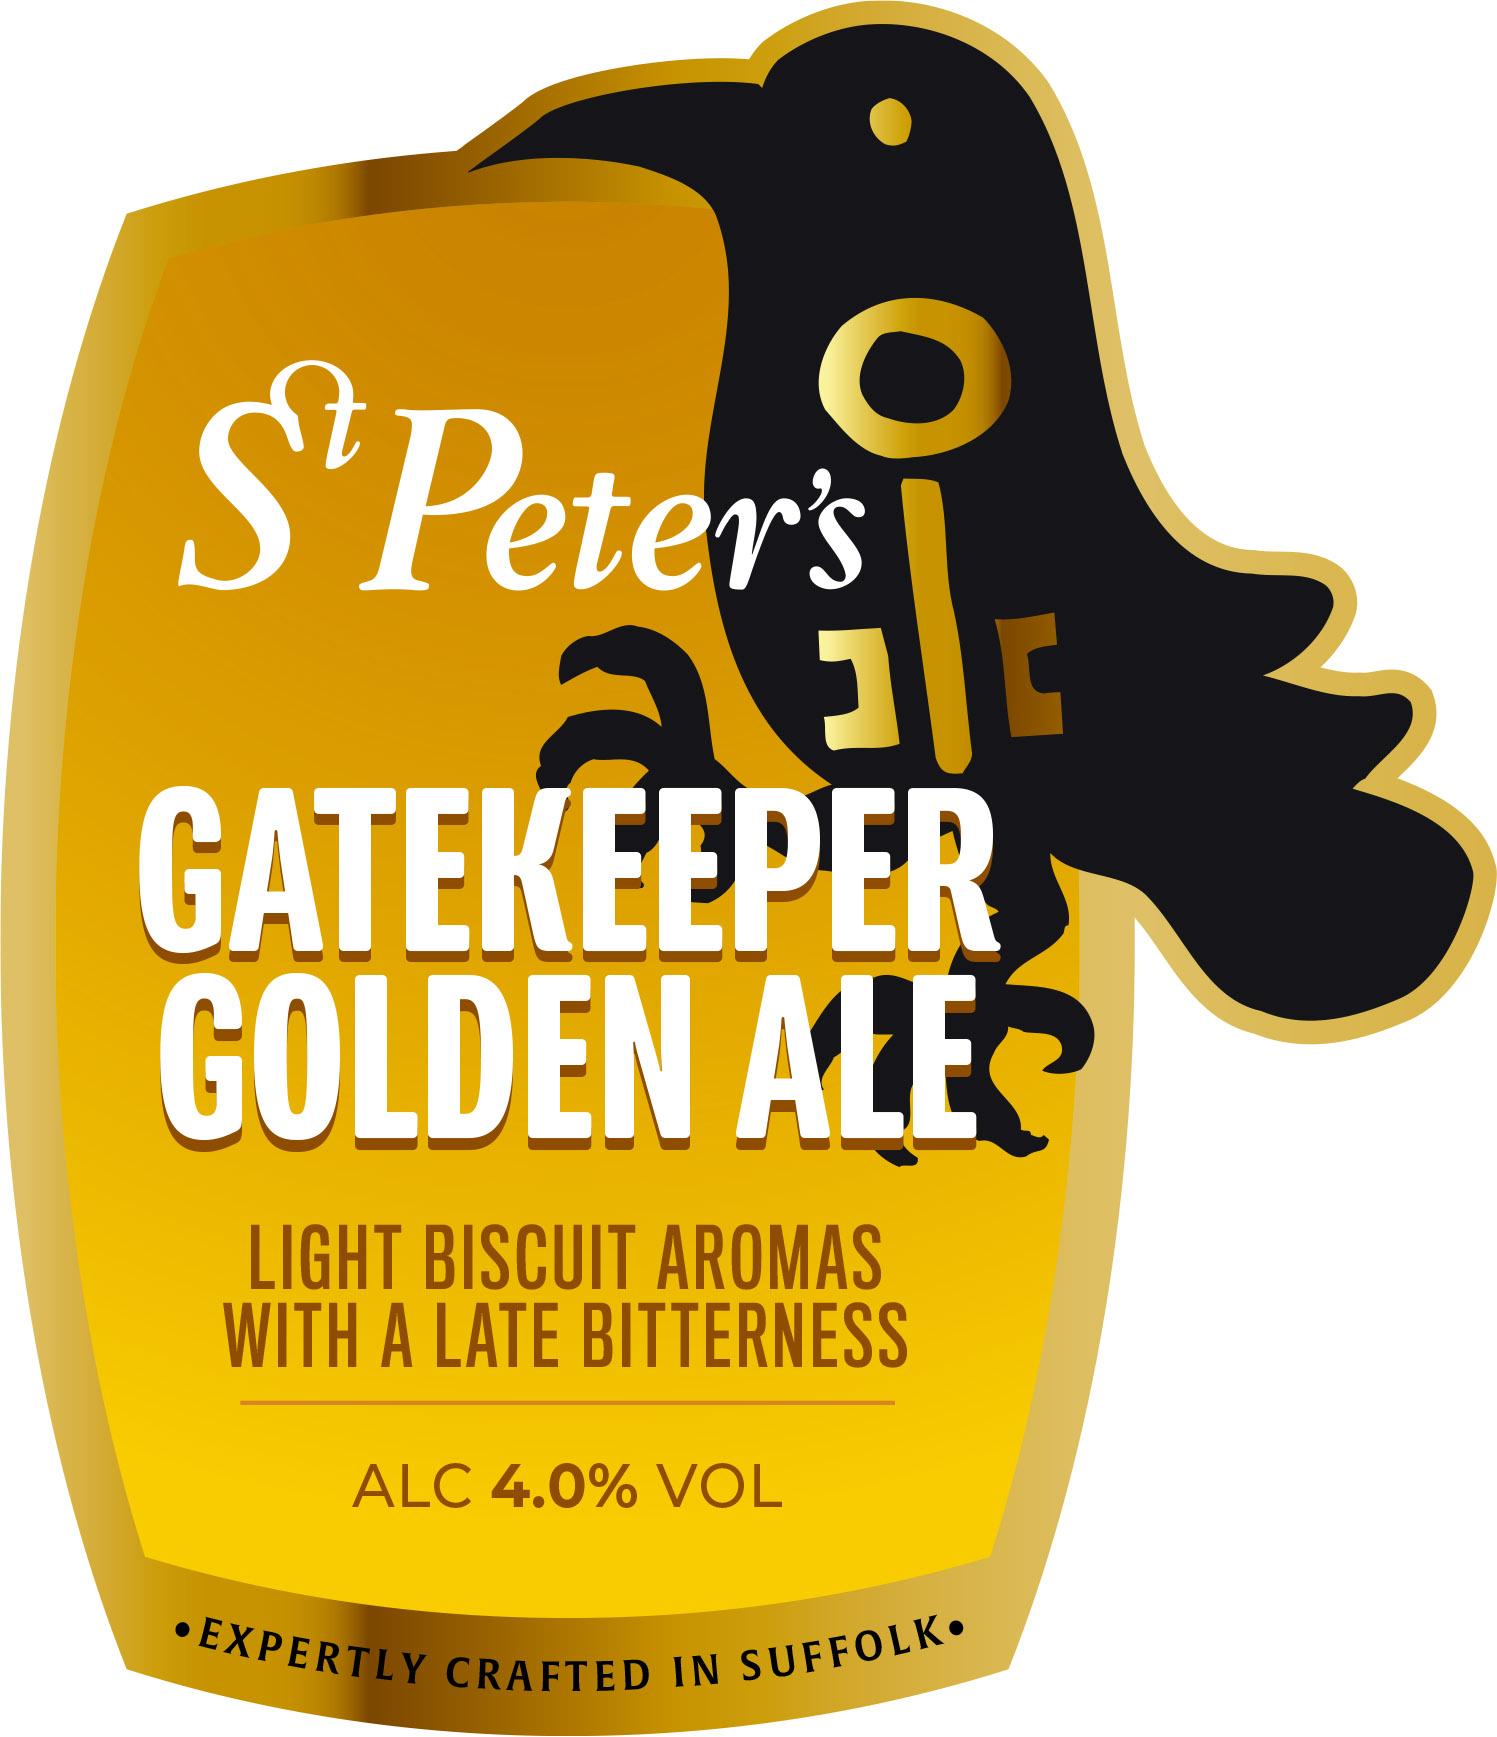 St Peters Gatekeeper Golden Ale 9 Gallons Golden    4.0%